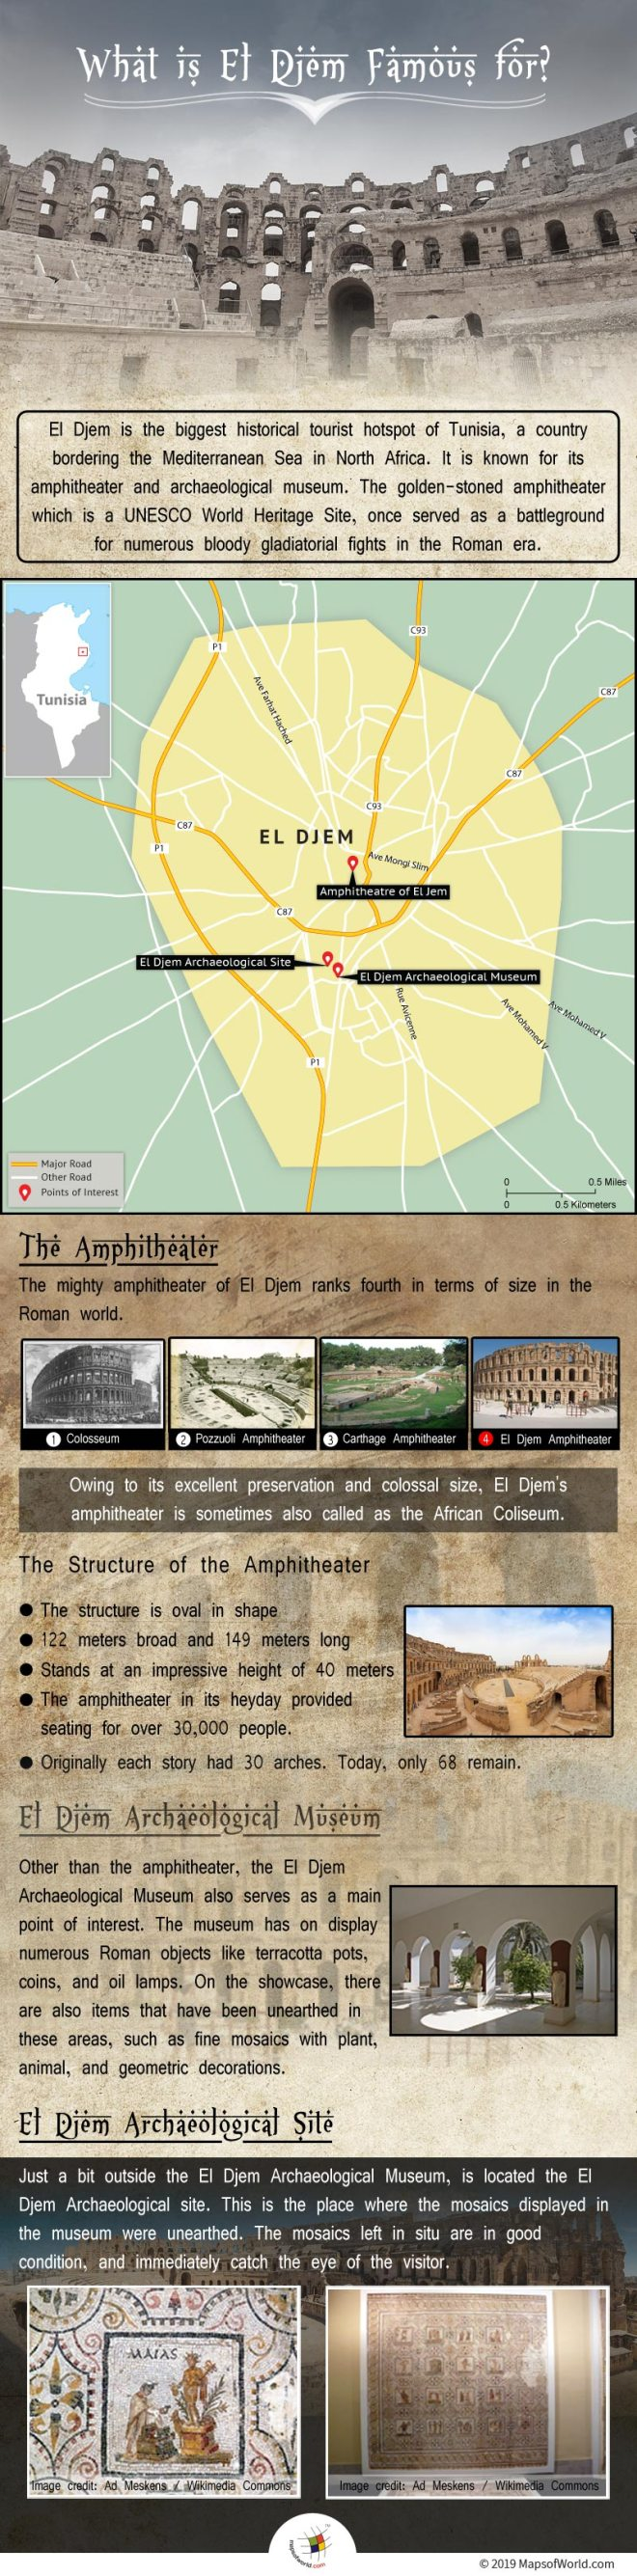 Infographic Giving Details on El Djem Famous Sites